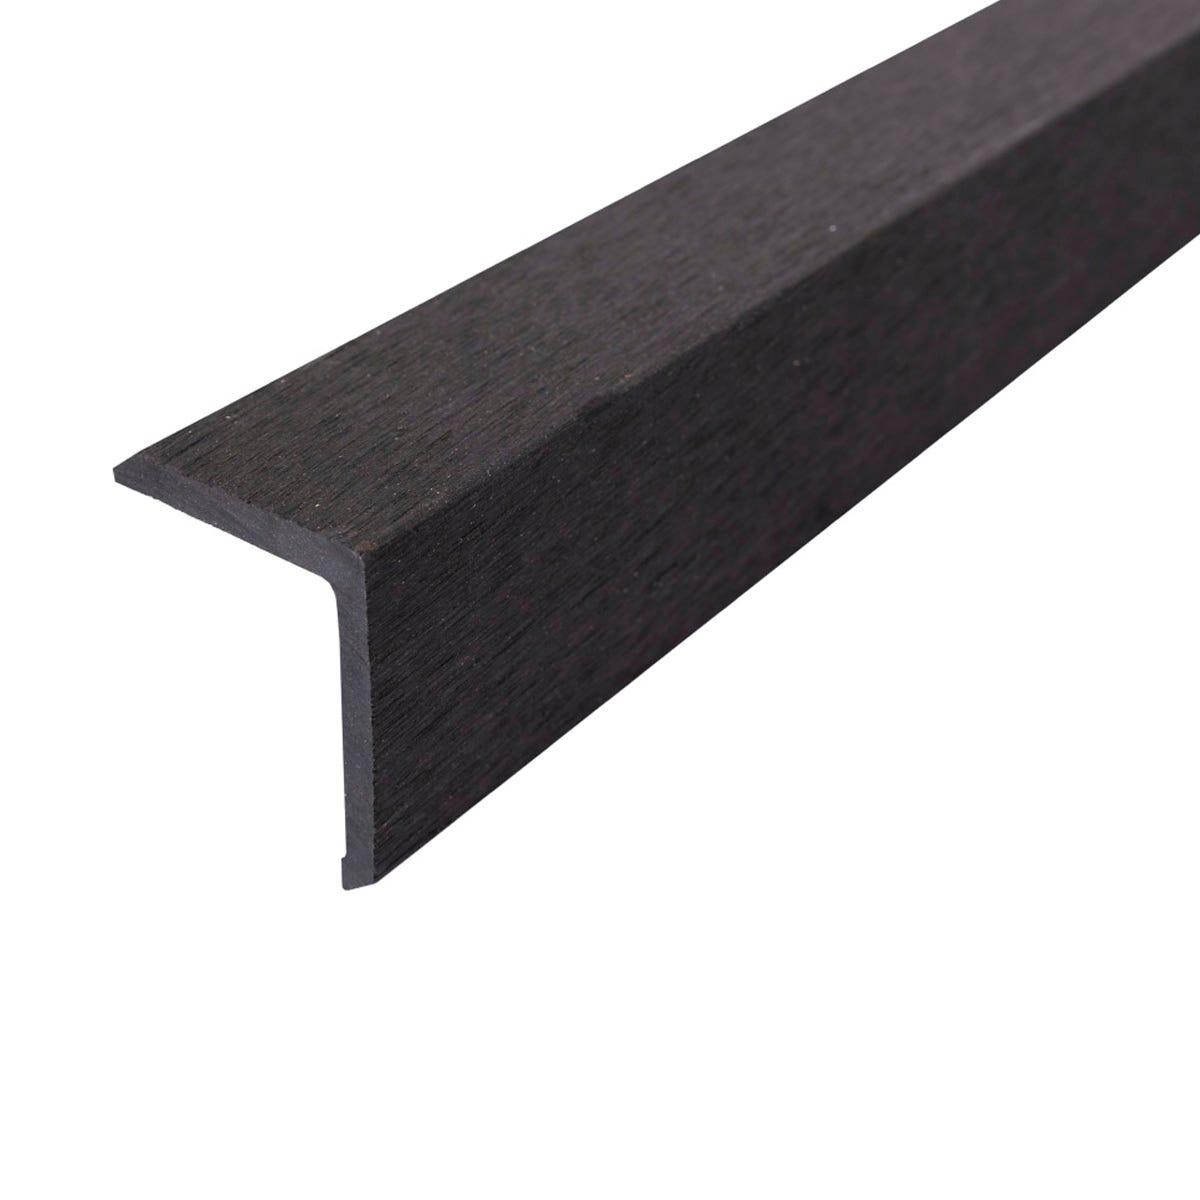 Select Composite Decking 1.8m Corner Trim Pk 5 - Dark Grey